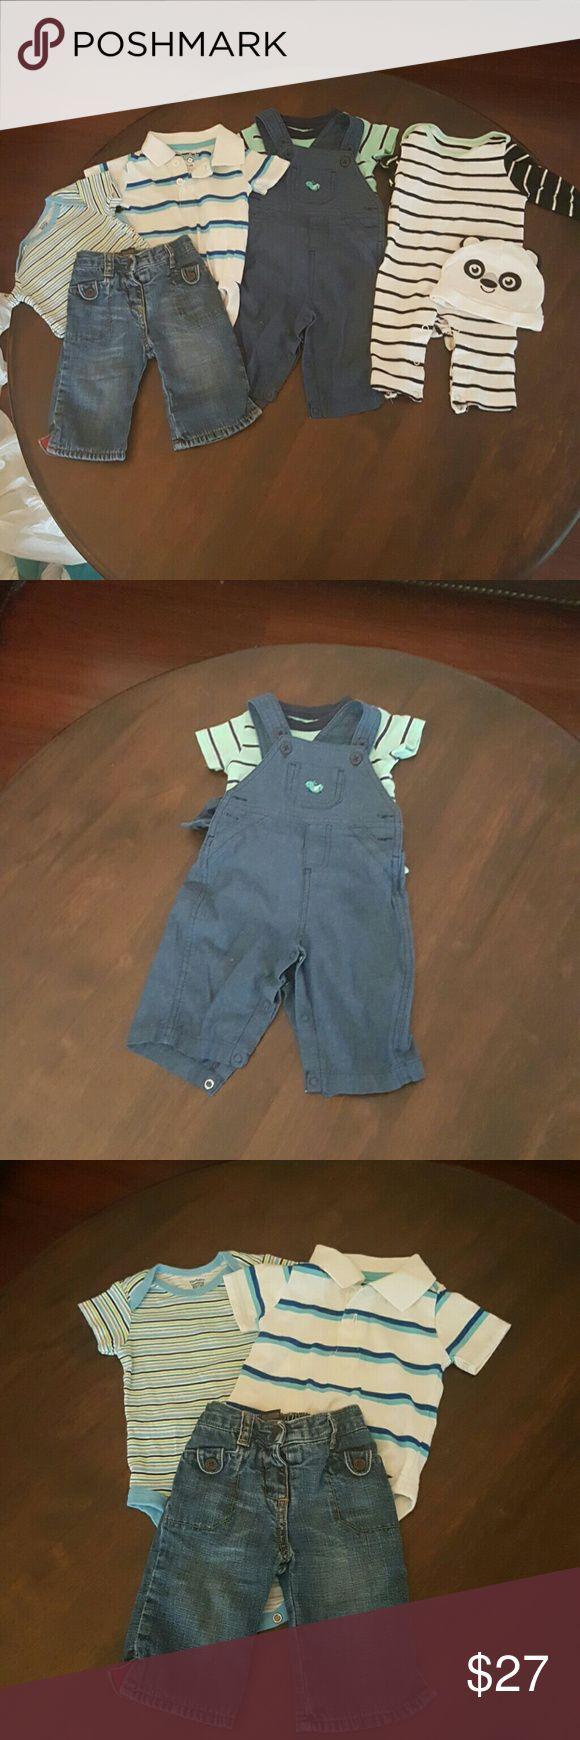 nice Tendance salopette 2017 - Baby boy bundle 3-6 months  (#5) Child of mine overalls and shirt, garanimal col...